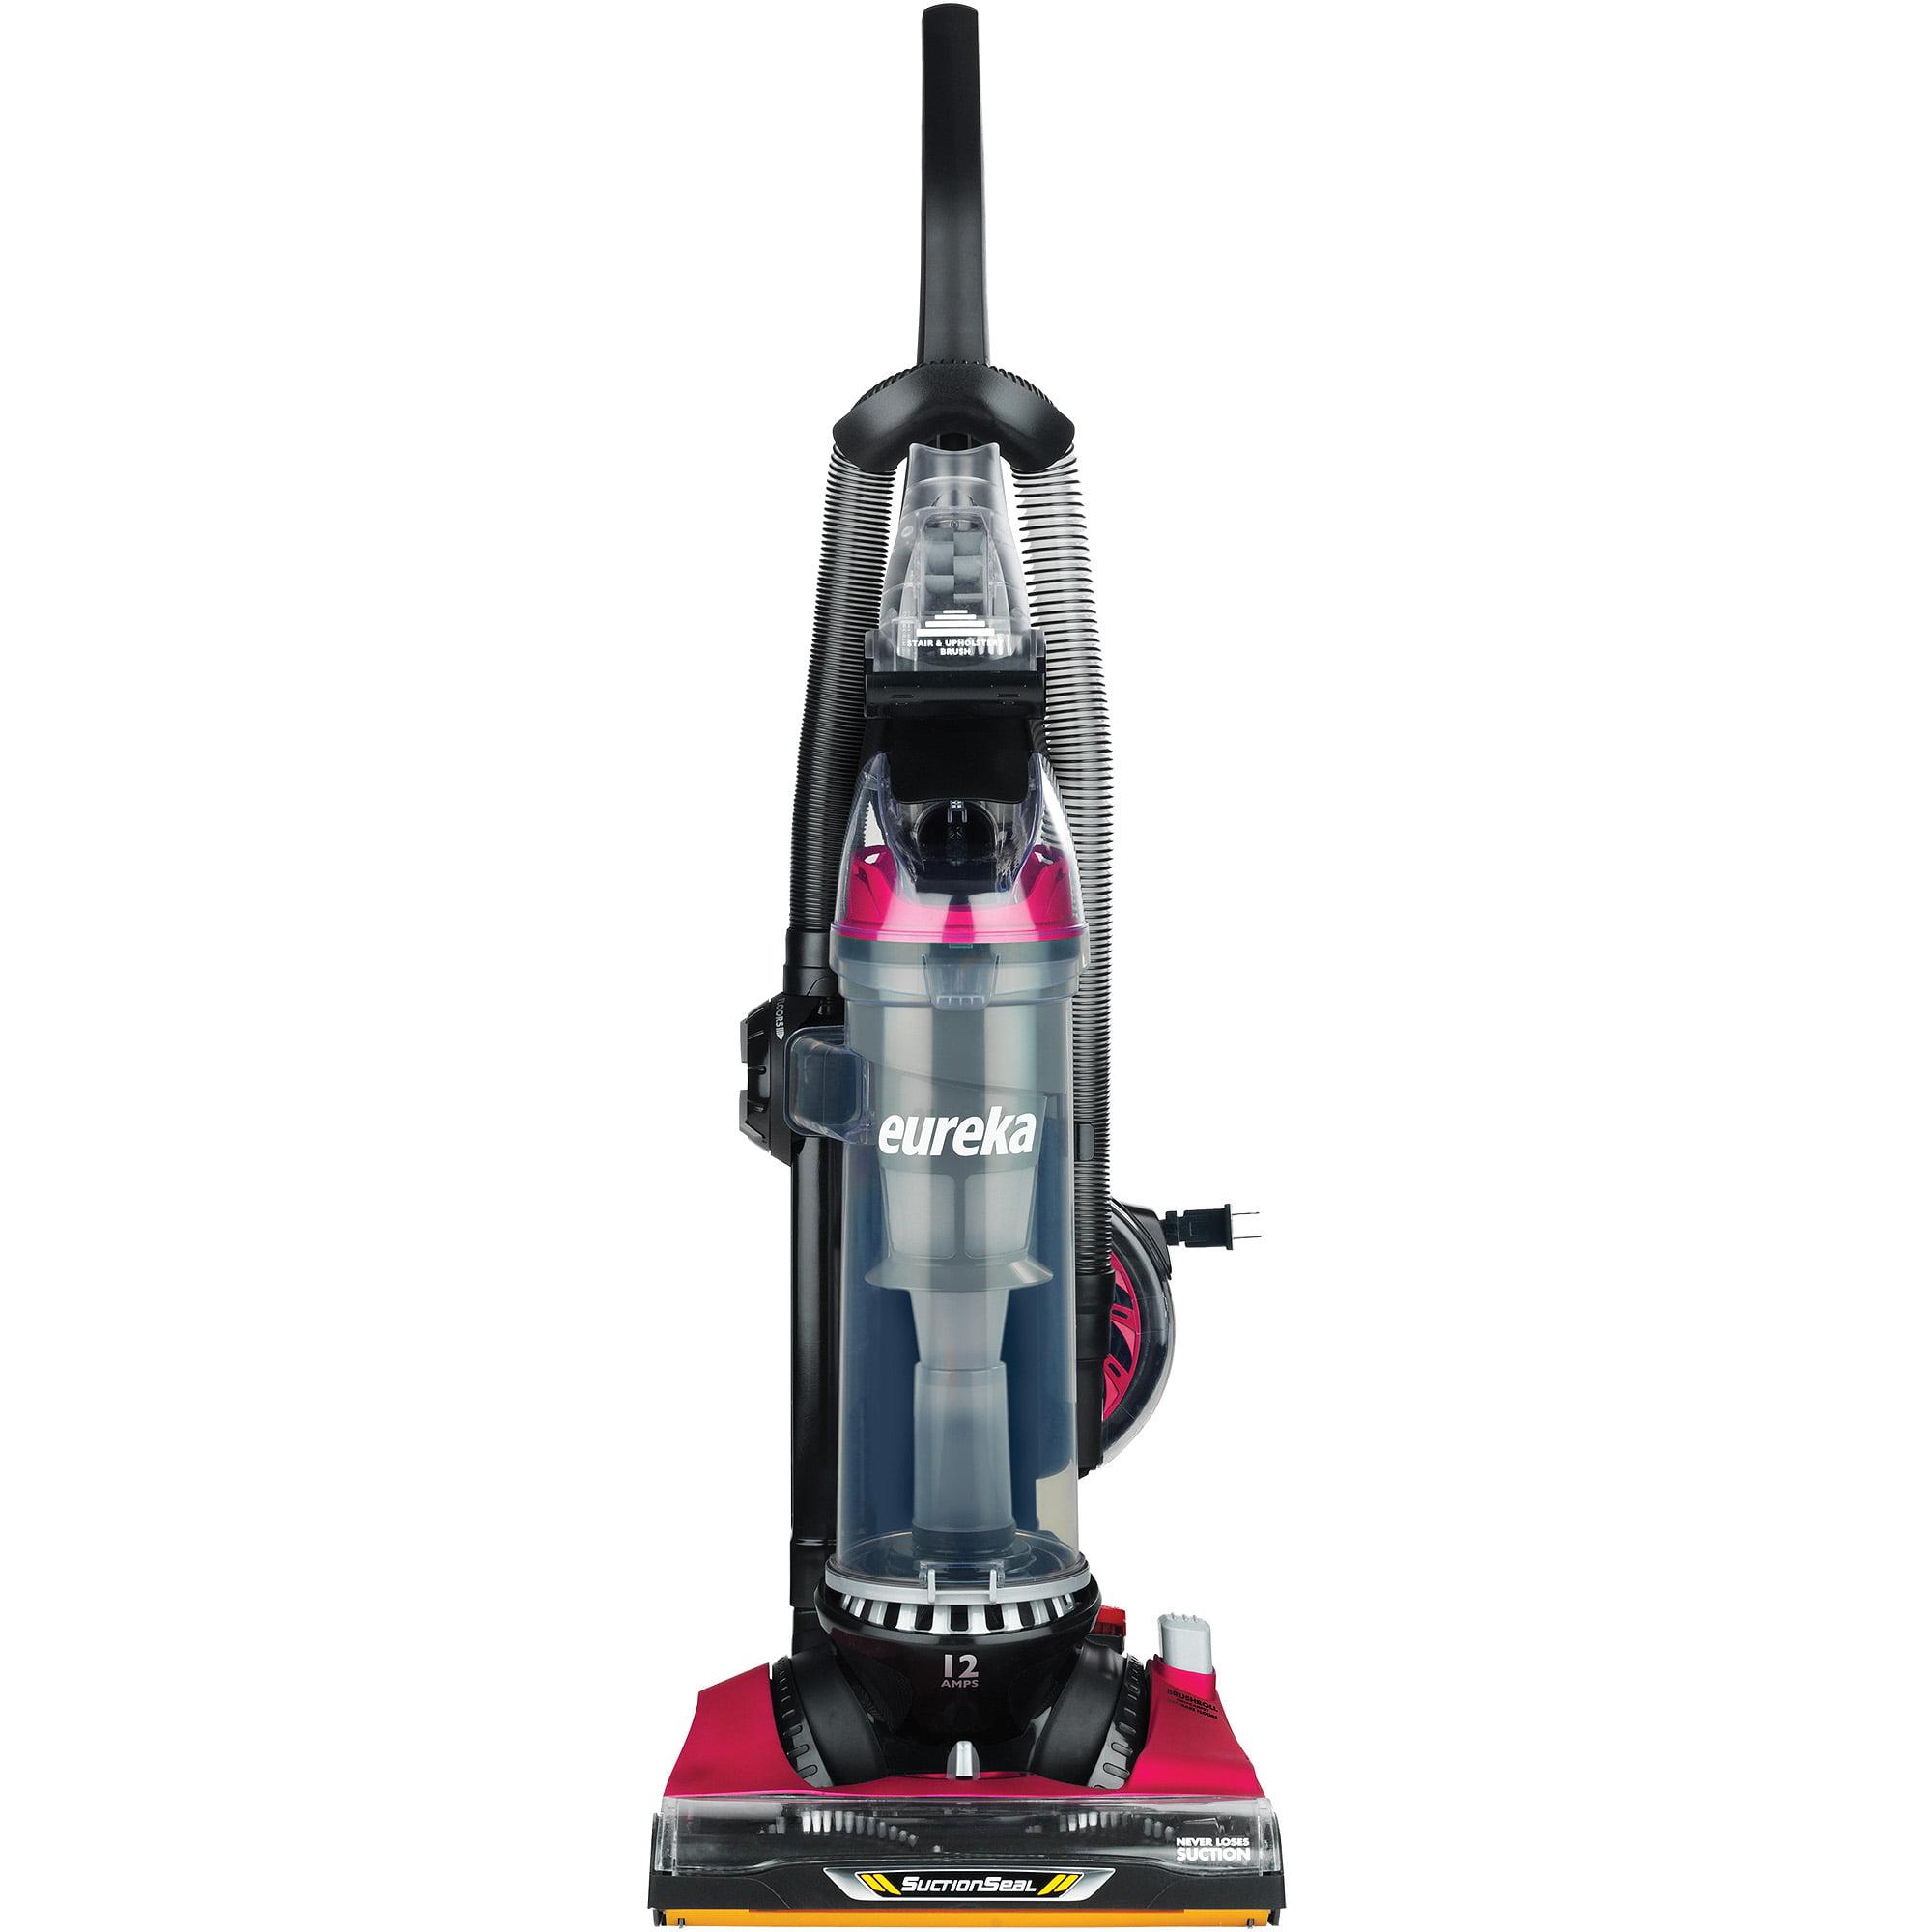 Eureka Suctionseal 2 0 Rewind Bagless Upright Vacuum